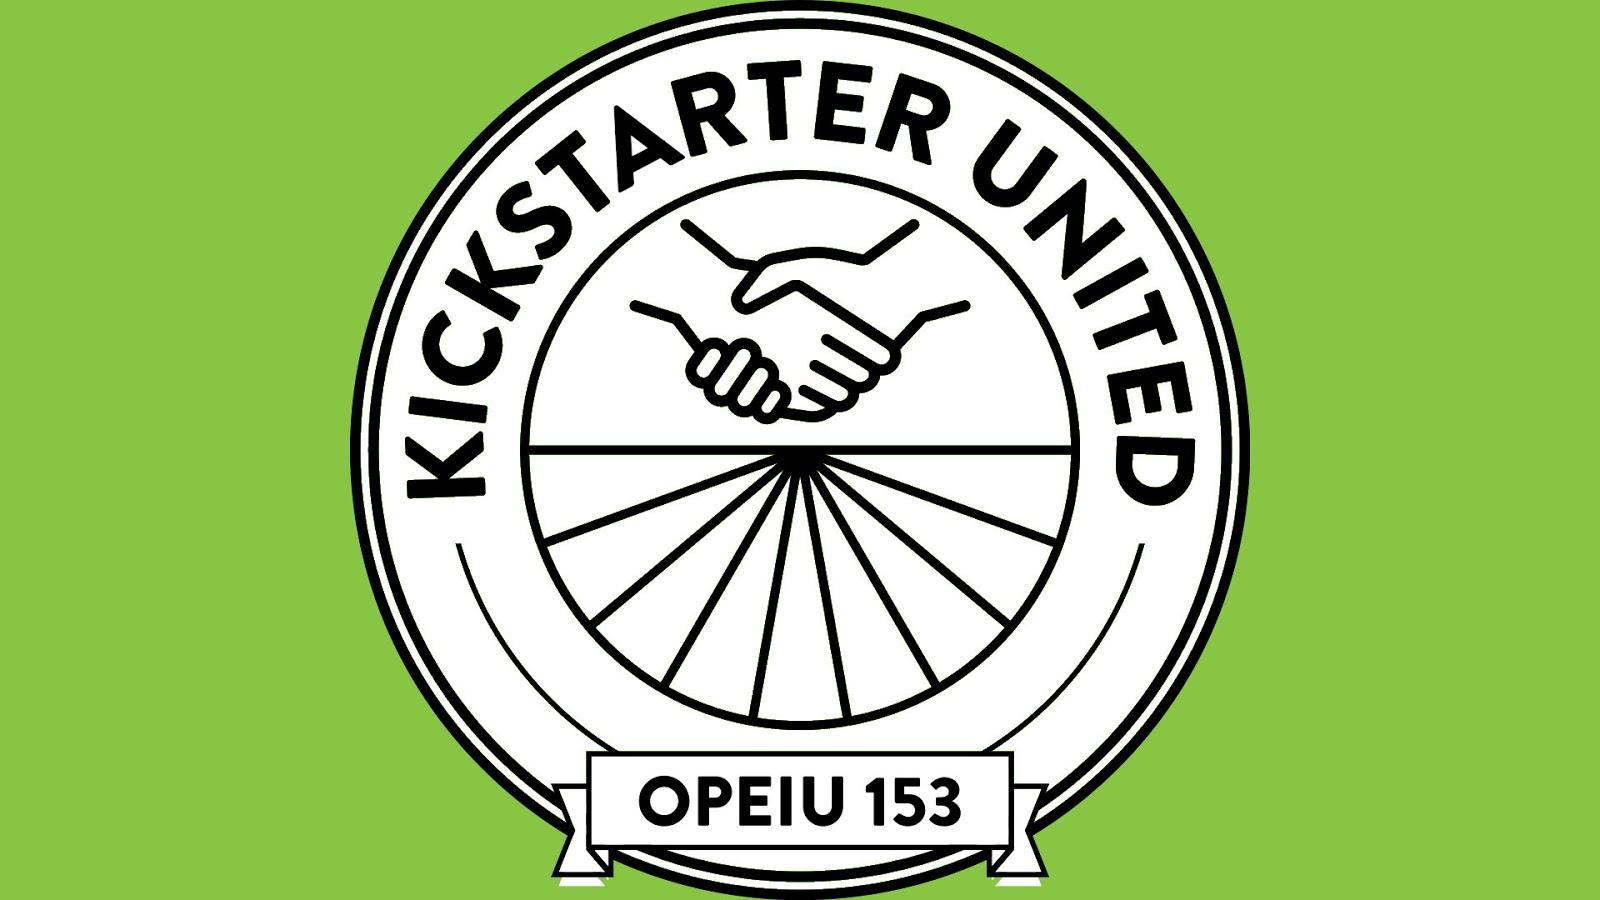 Board Games News Collider Kickstarter United certified Union